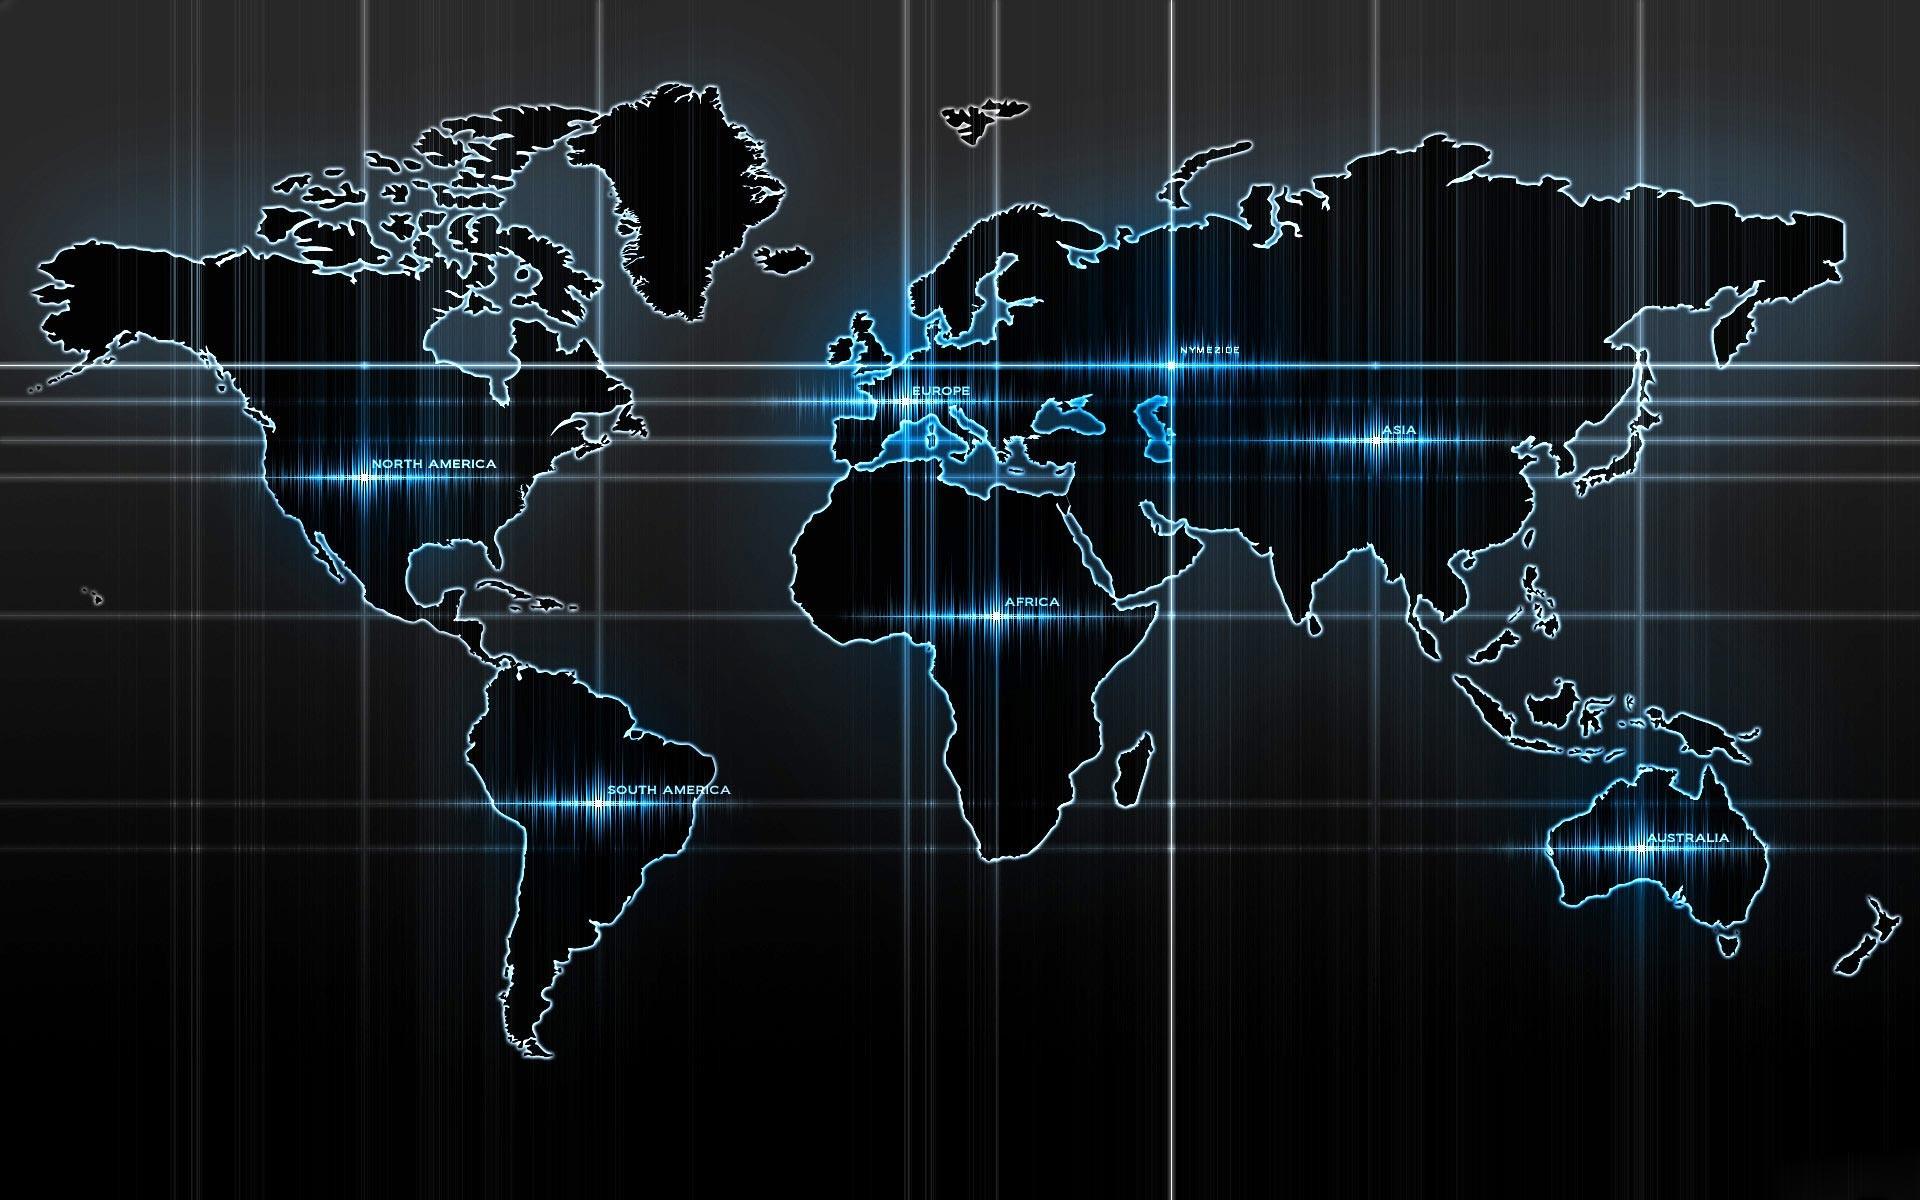 World map desktop wallpaper hd 70 images 1920x1200 world map wallpaper hd wallpapers hd pics publicscrutiny Choice Image